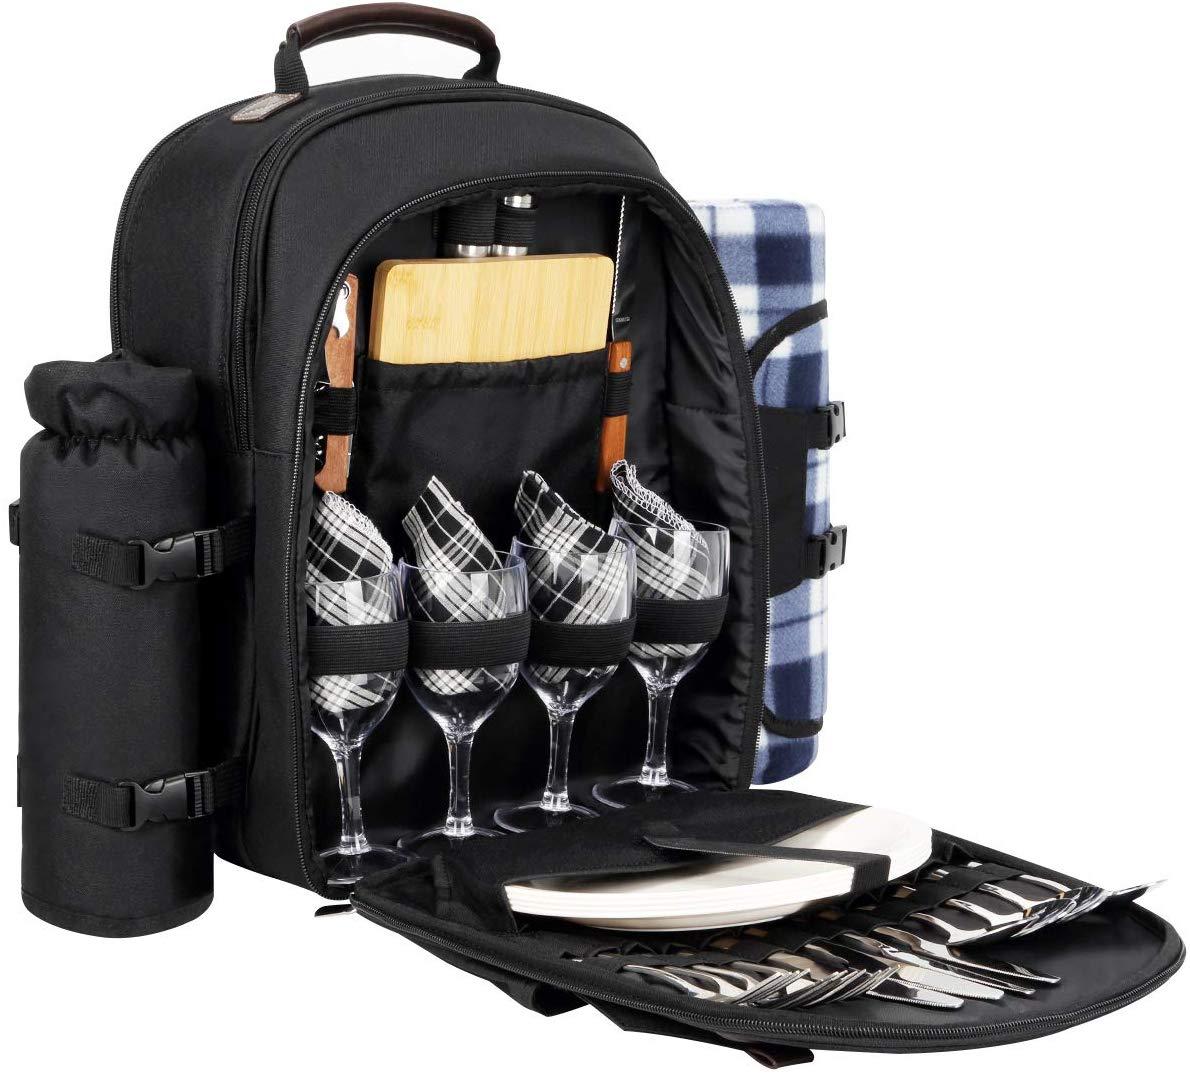 Sunflora Picnic Backpack (Black)